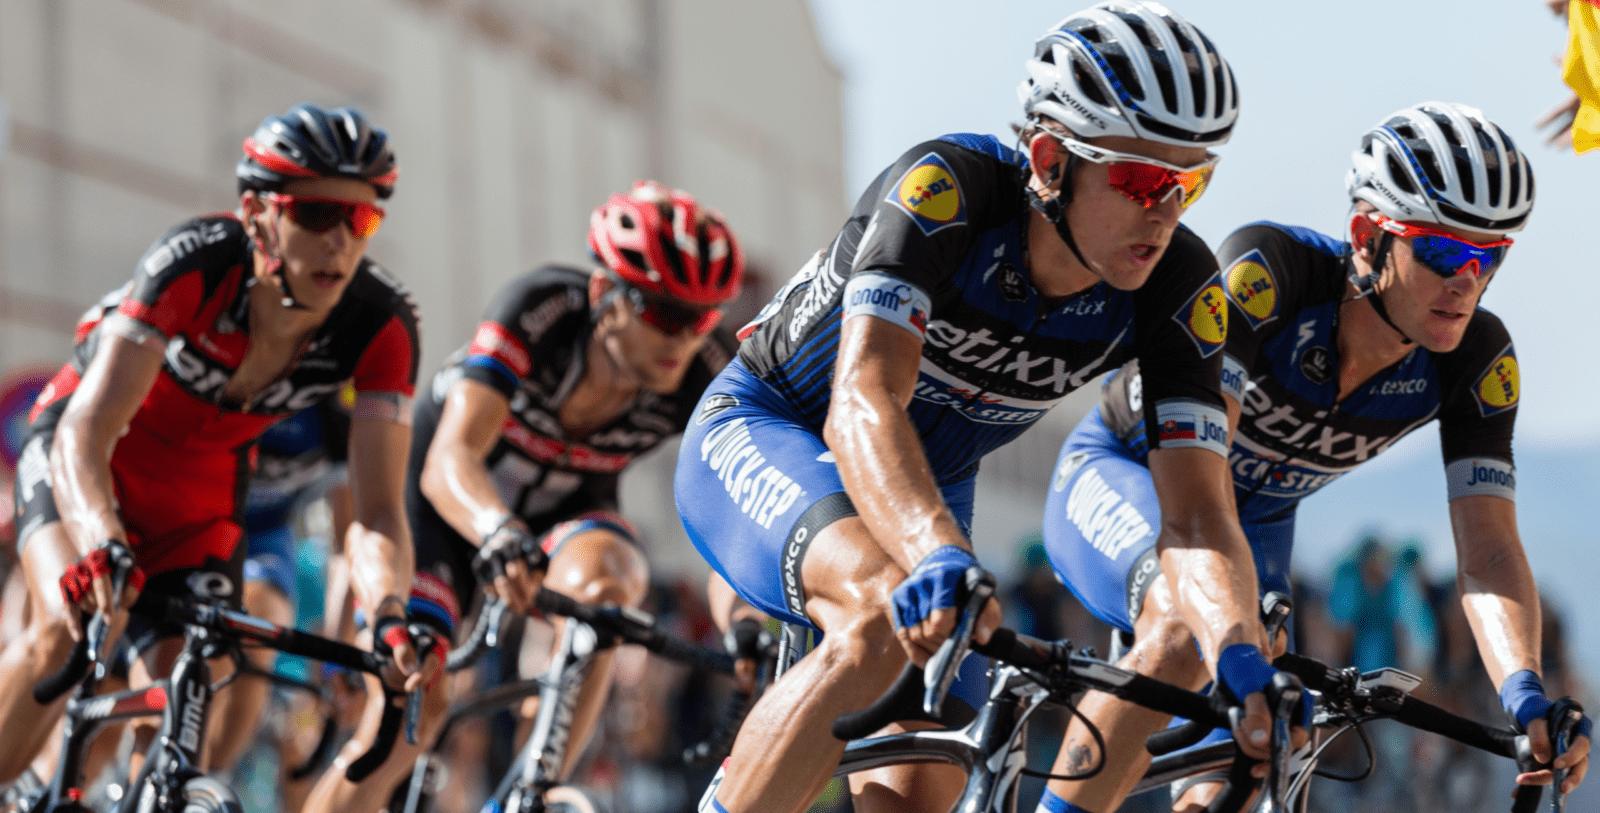 Conheça 3 modalidades do ciclismo: pista, mountain bike e BMX